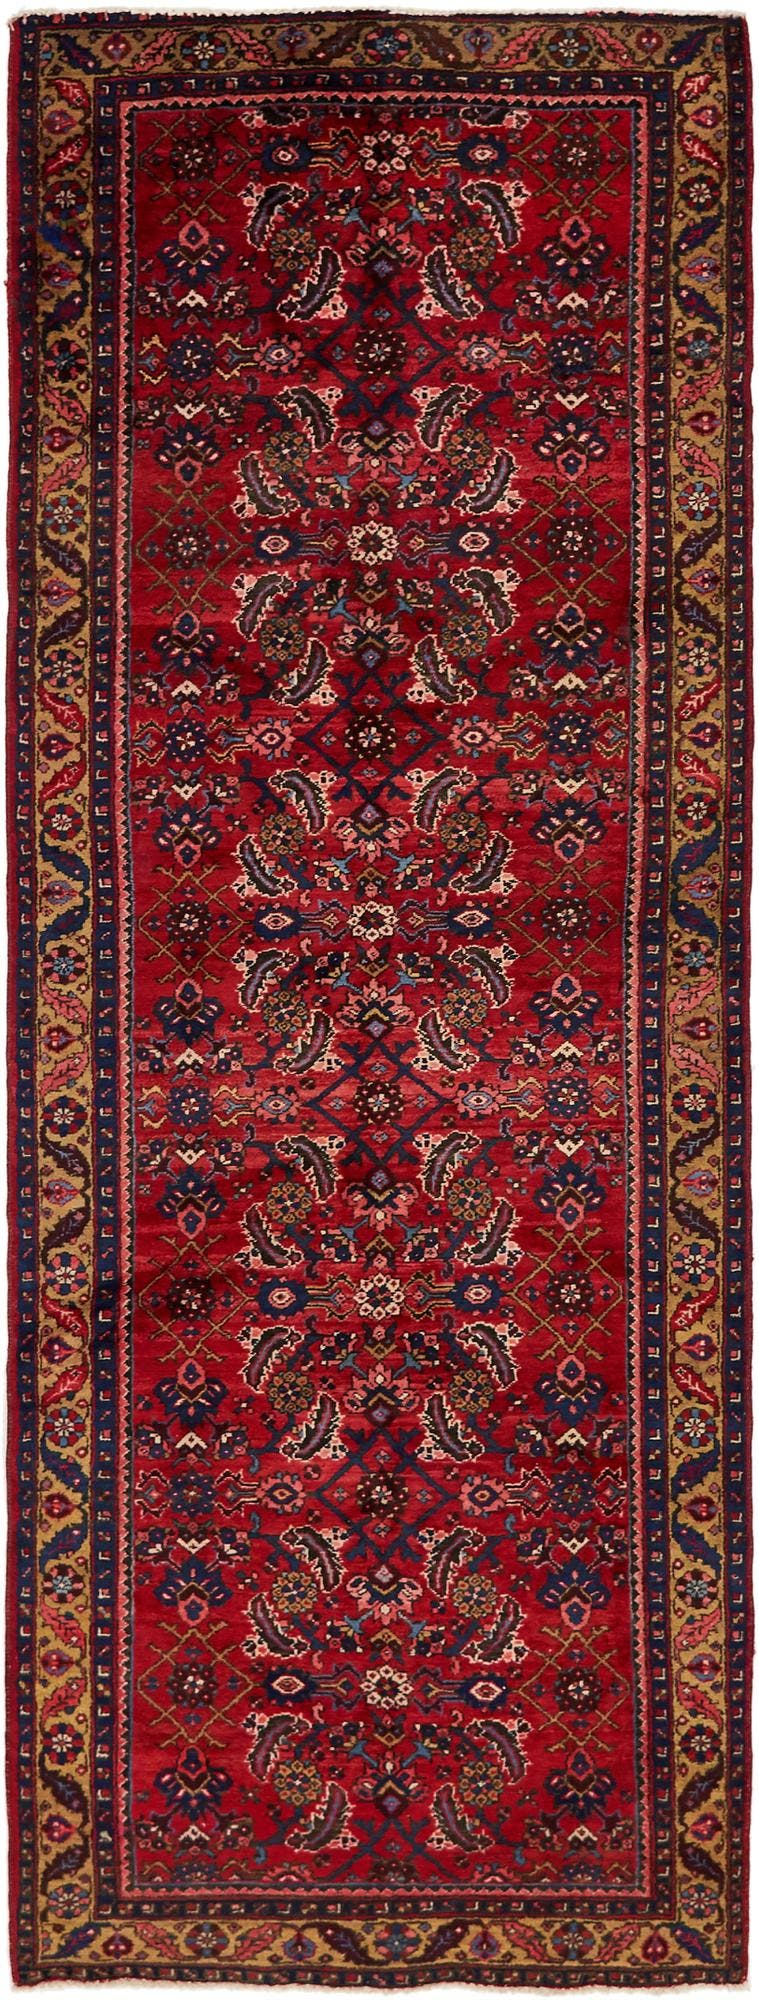 3' 10 x 10' 10 Sarab Persian Runner Rug main image